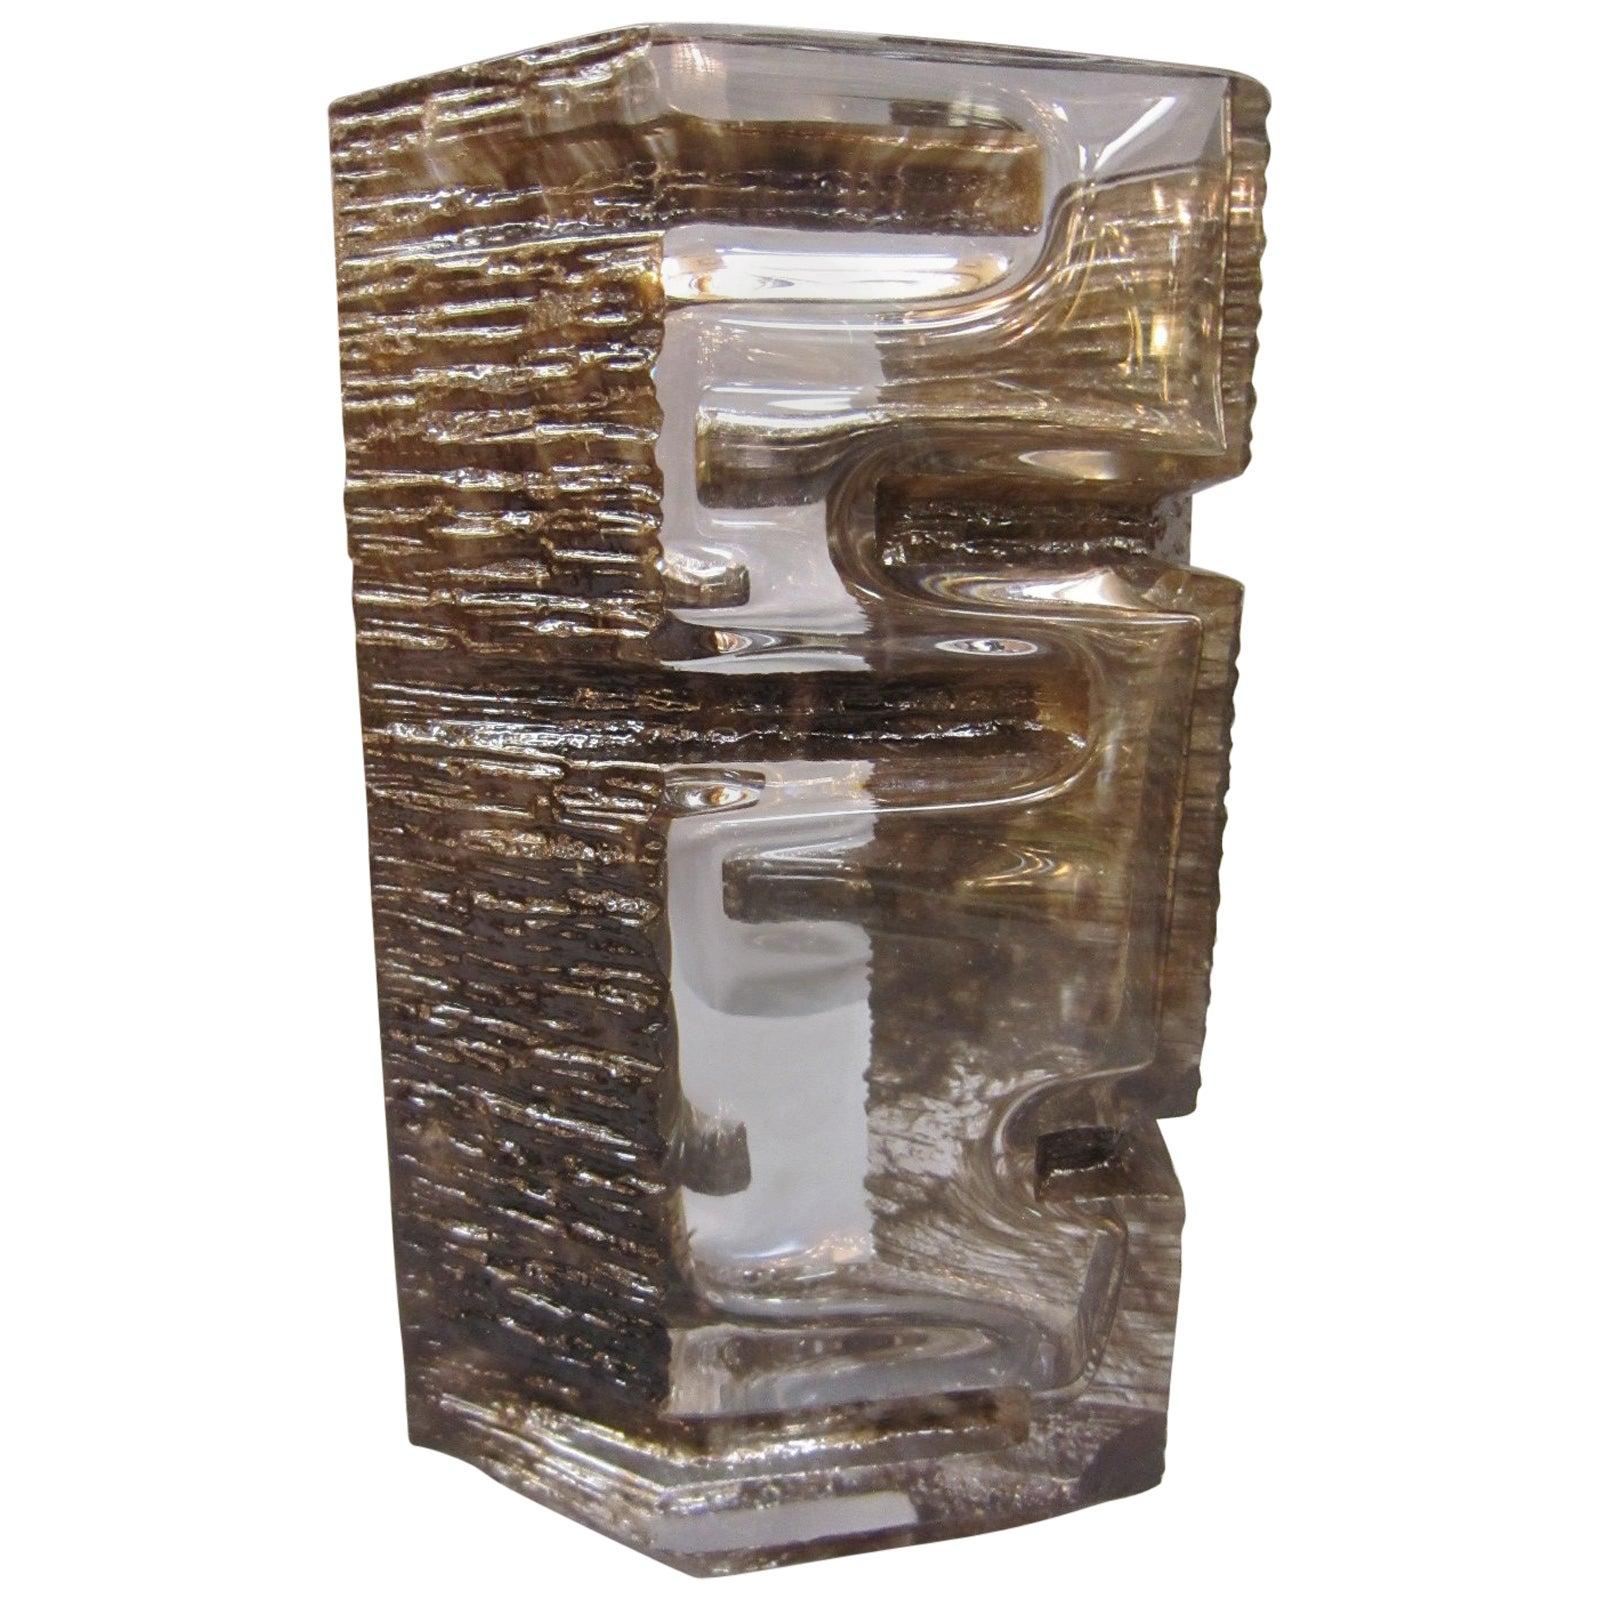 Sculptural 1970s Daum Vase by César Baldaccini